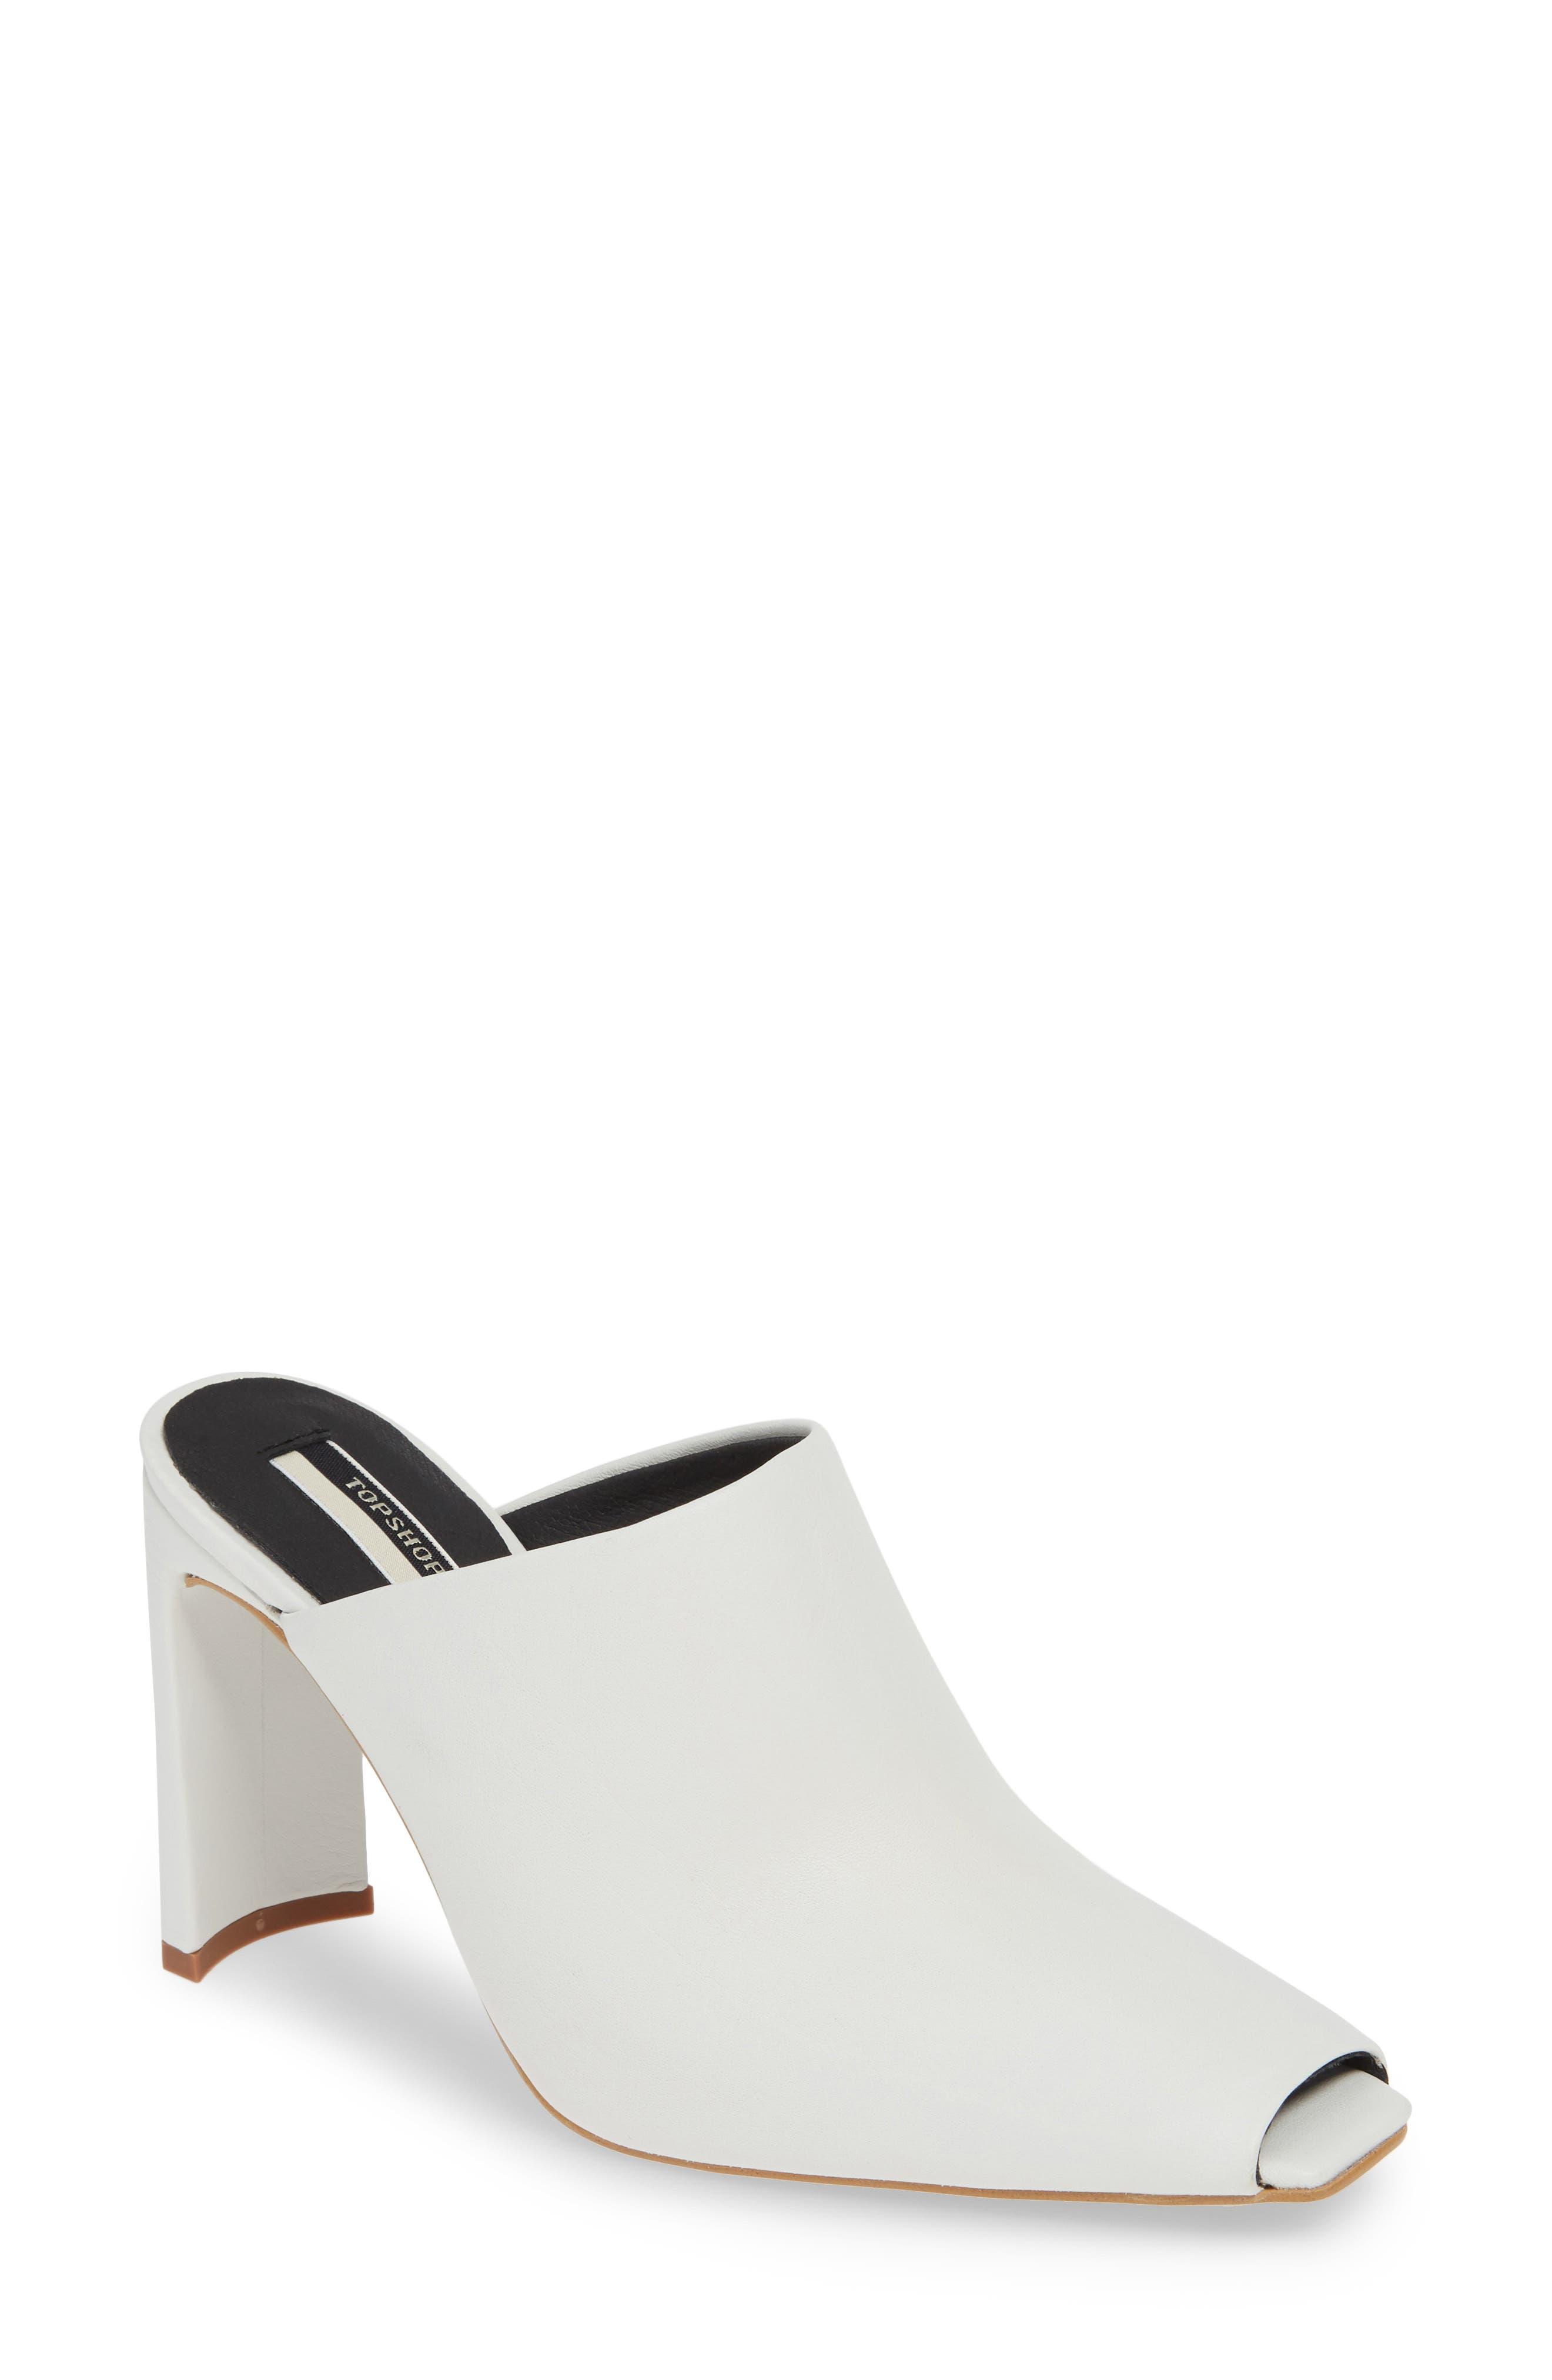 Topshop Geneva Peep Toe Mule - White